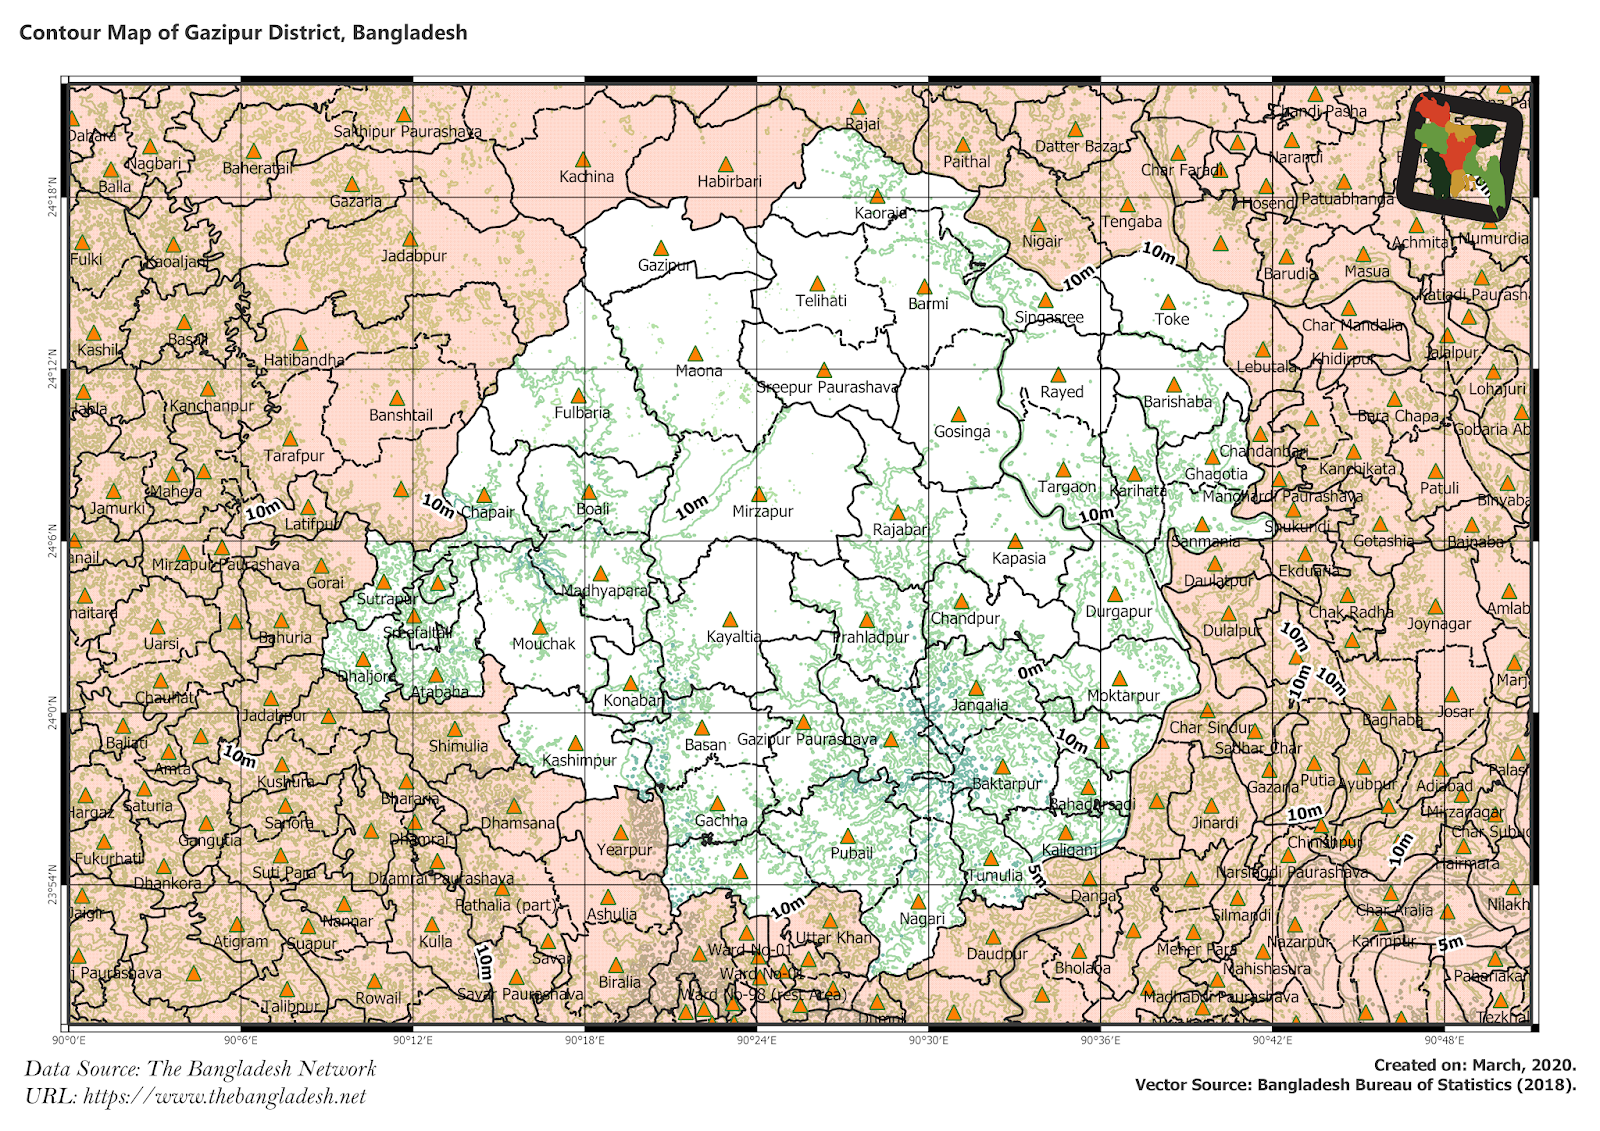 Elevation Map of Gazipur District of Bangladesh